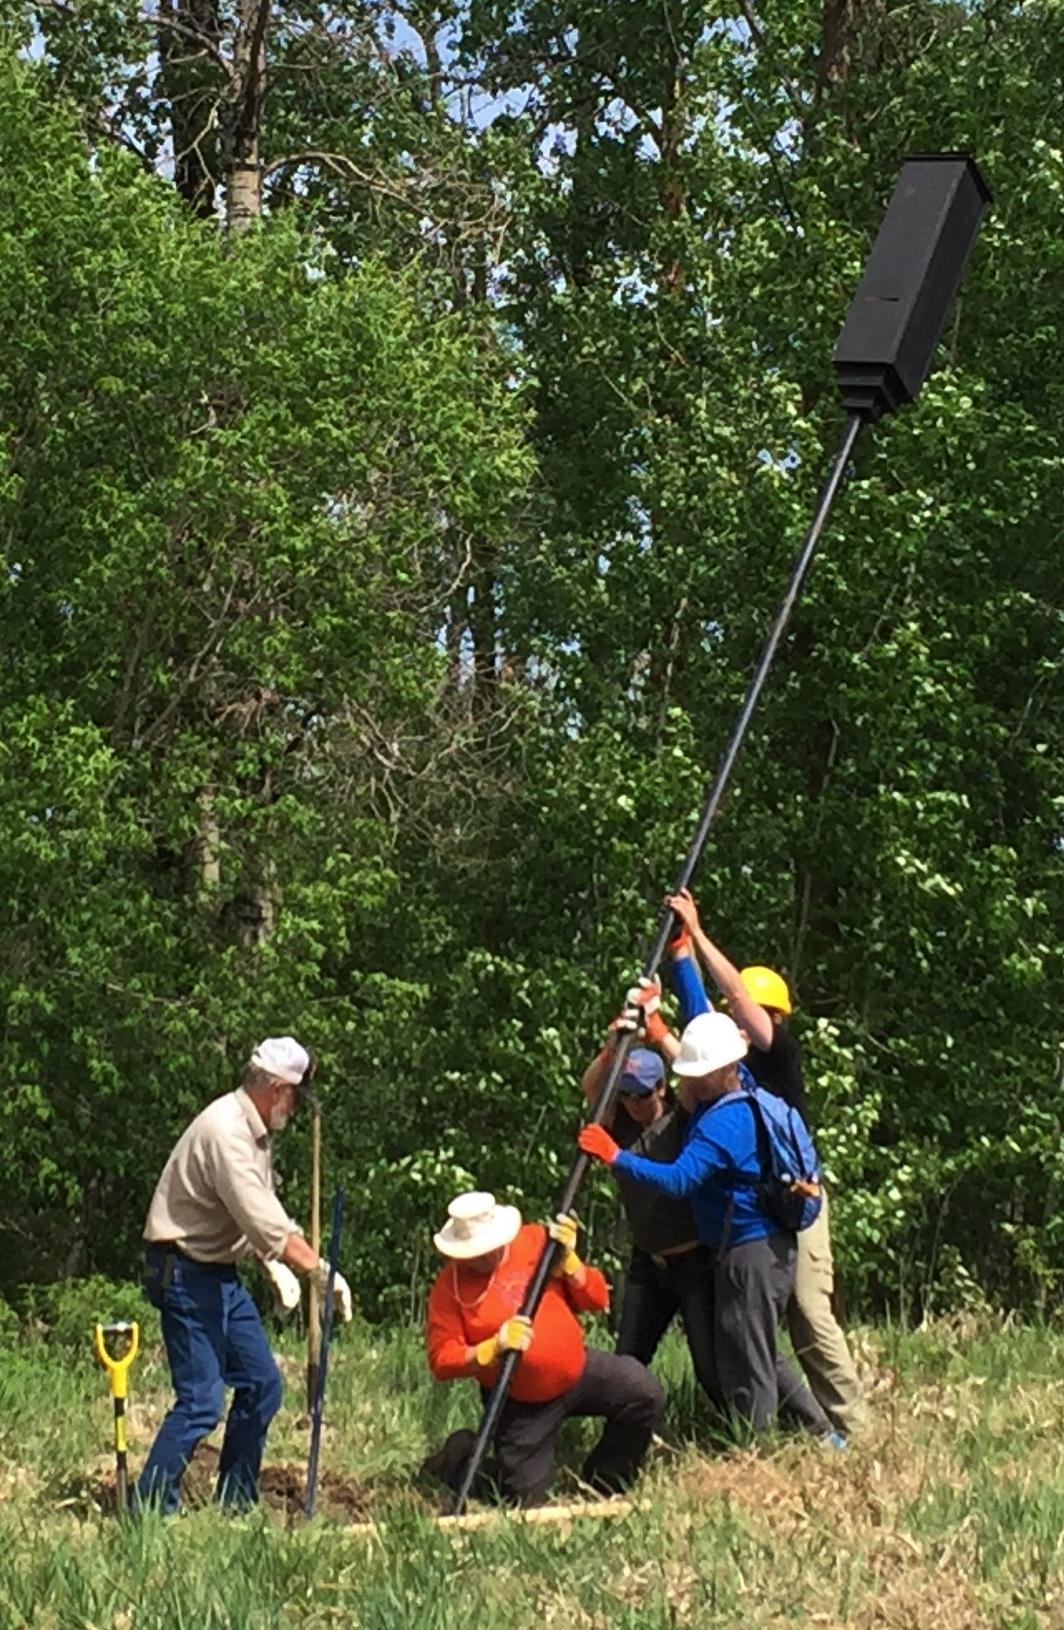 Volunteers installing our very first Rocket Bat Box at Boisvert's GreenWoods!